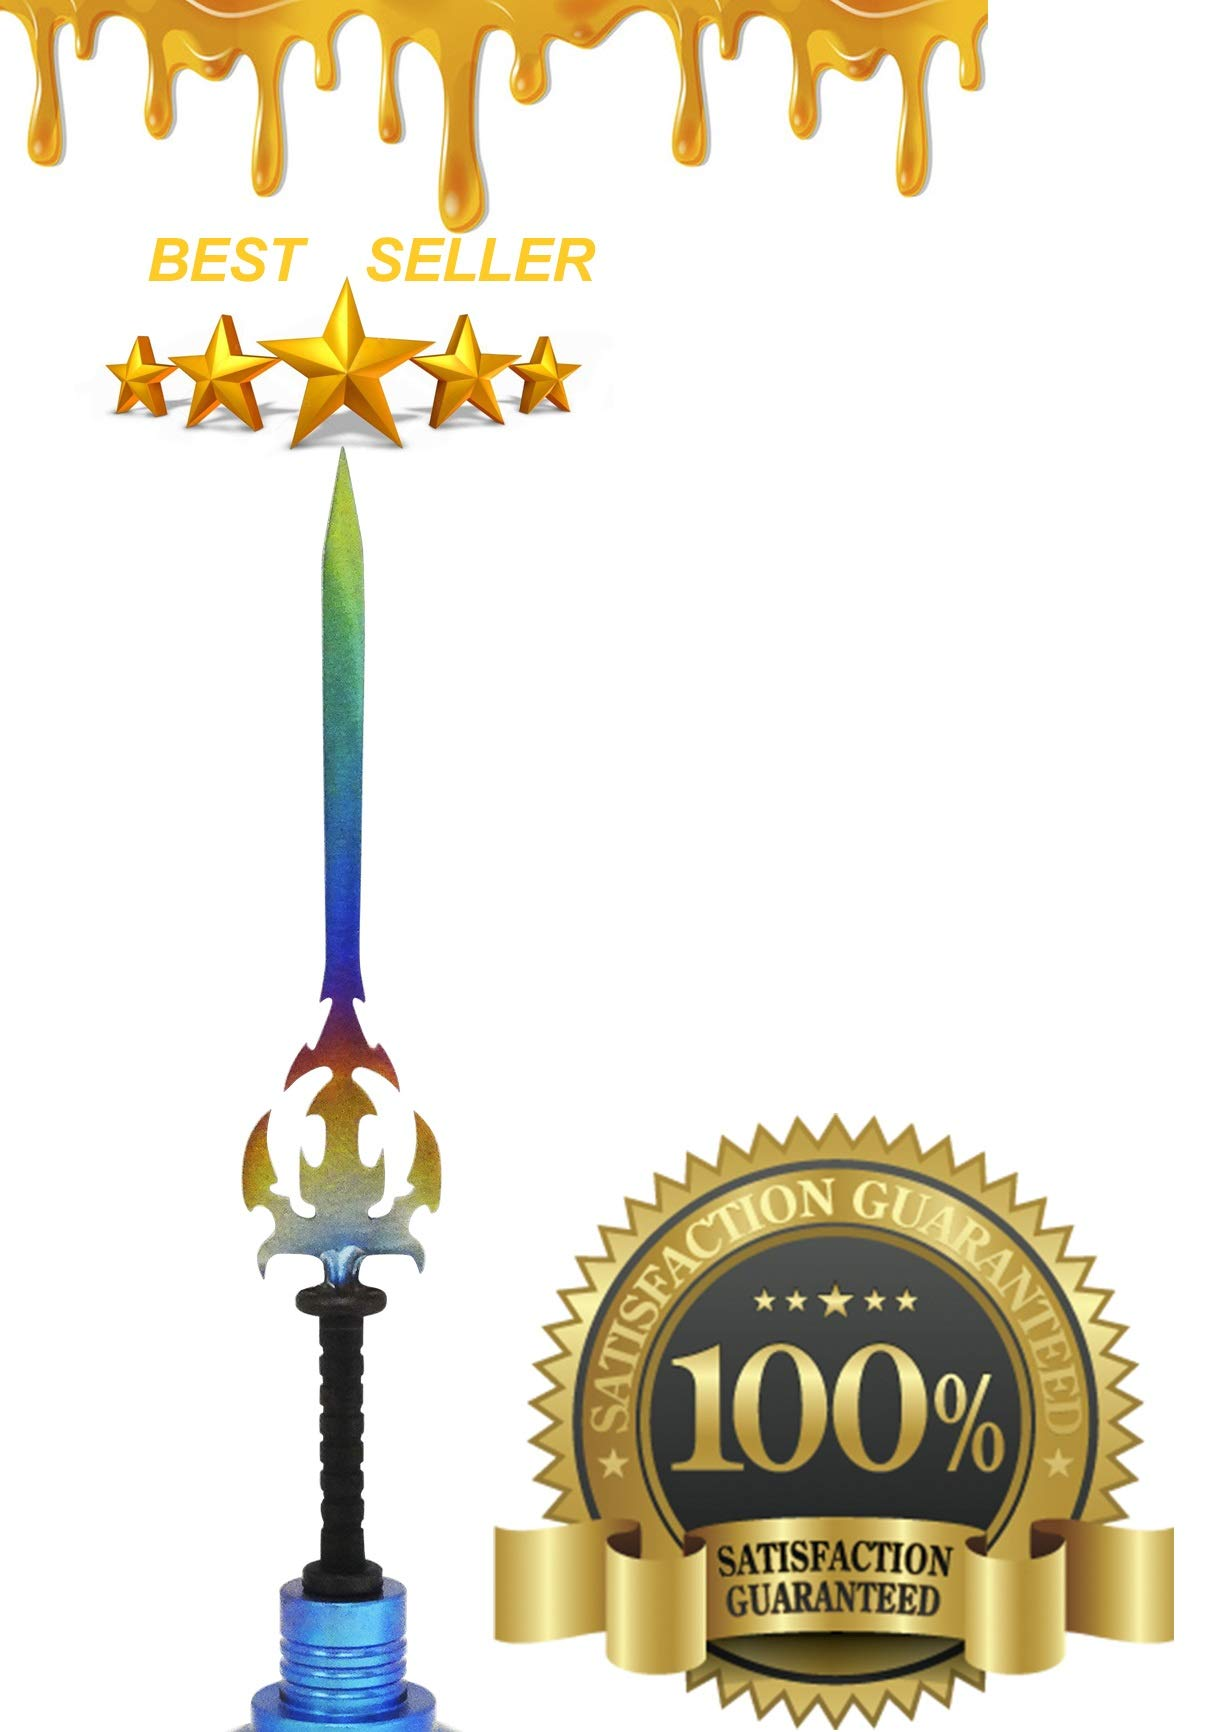 Wax Carving Titanium Tool - Kit Phenomenal Multi Colored & Precise Multi Purpose Edges GR2 Straight Sword Type Tool Craft Jewelry Wax Carvers Natural Mystic USA Brand